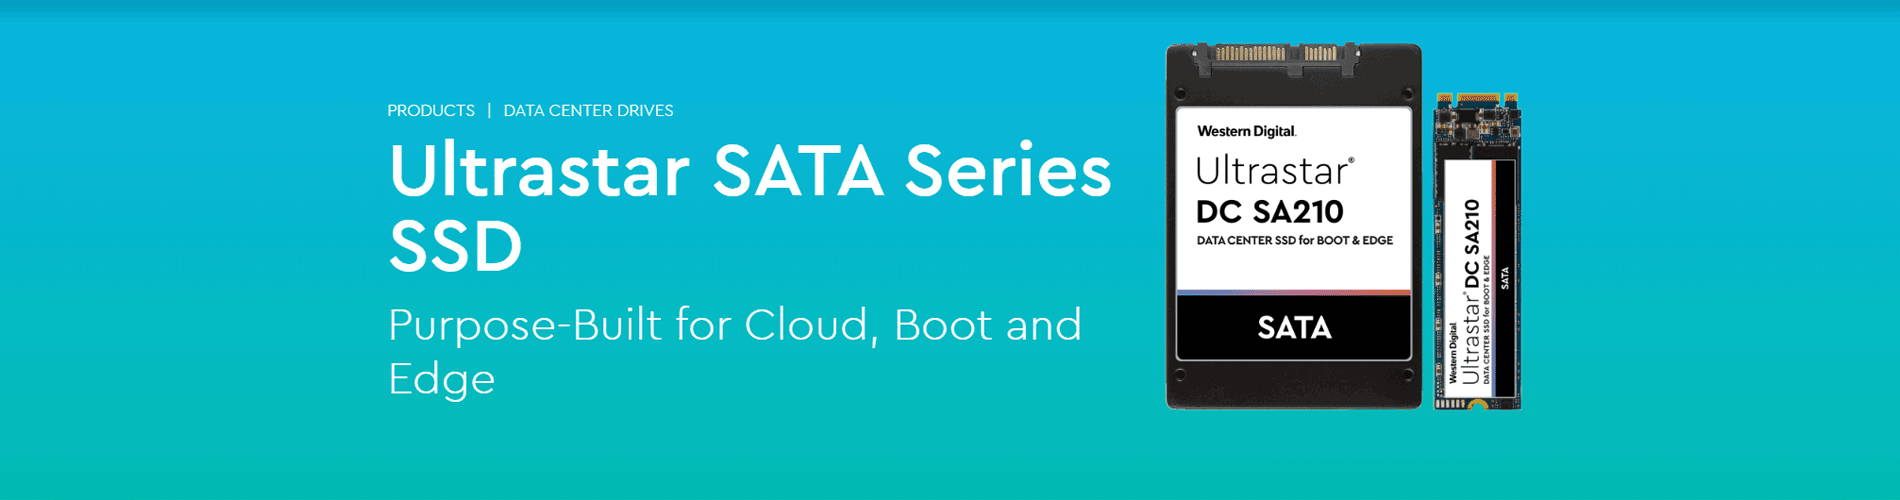 Ultrastar SATA Series SSD